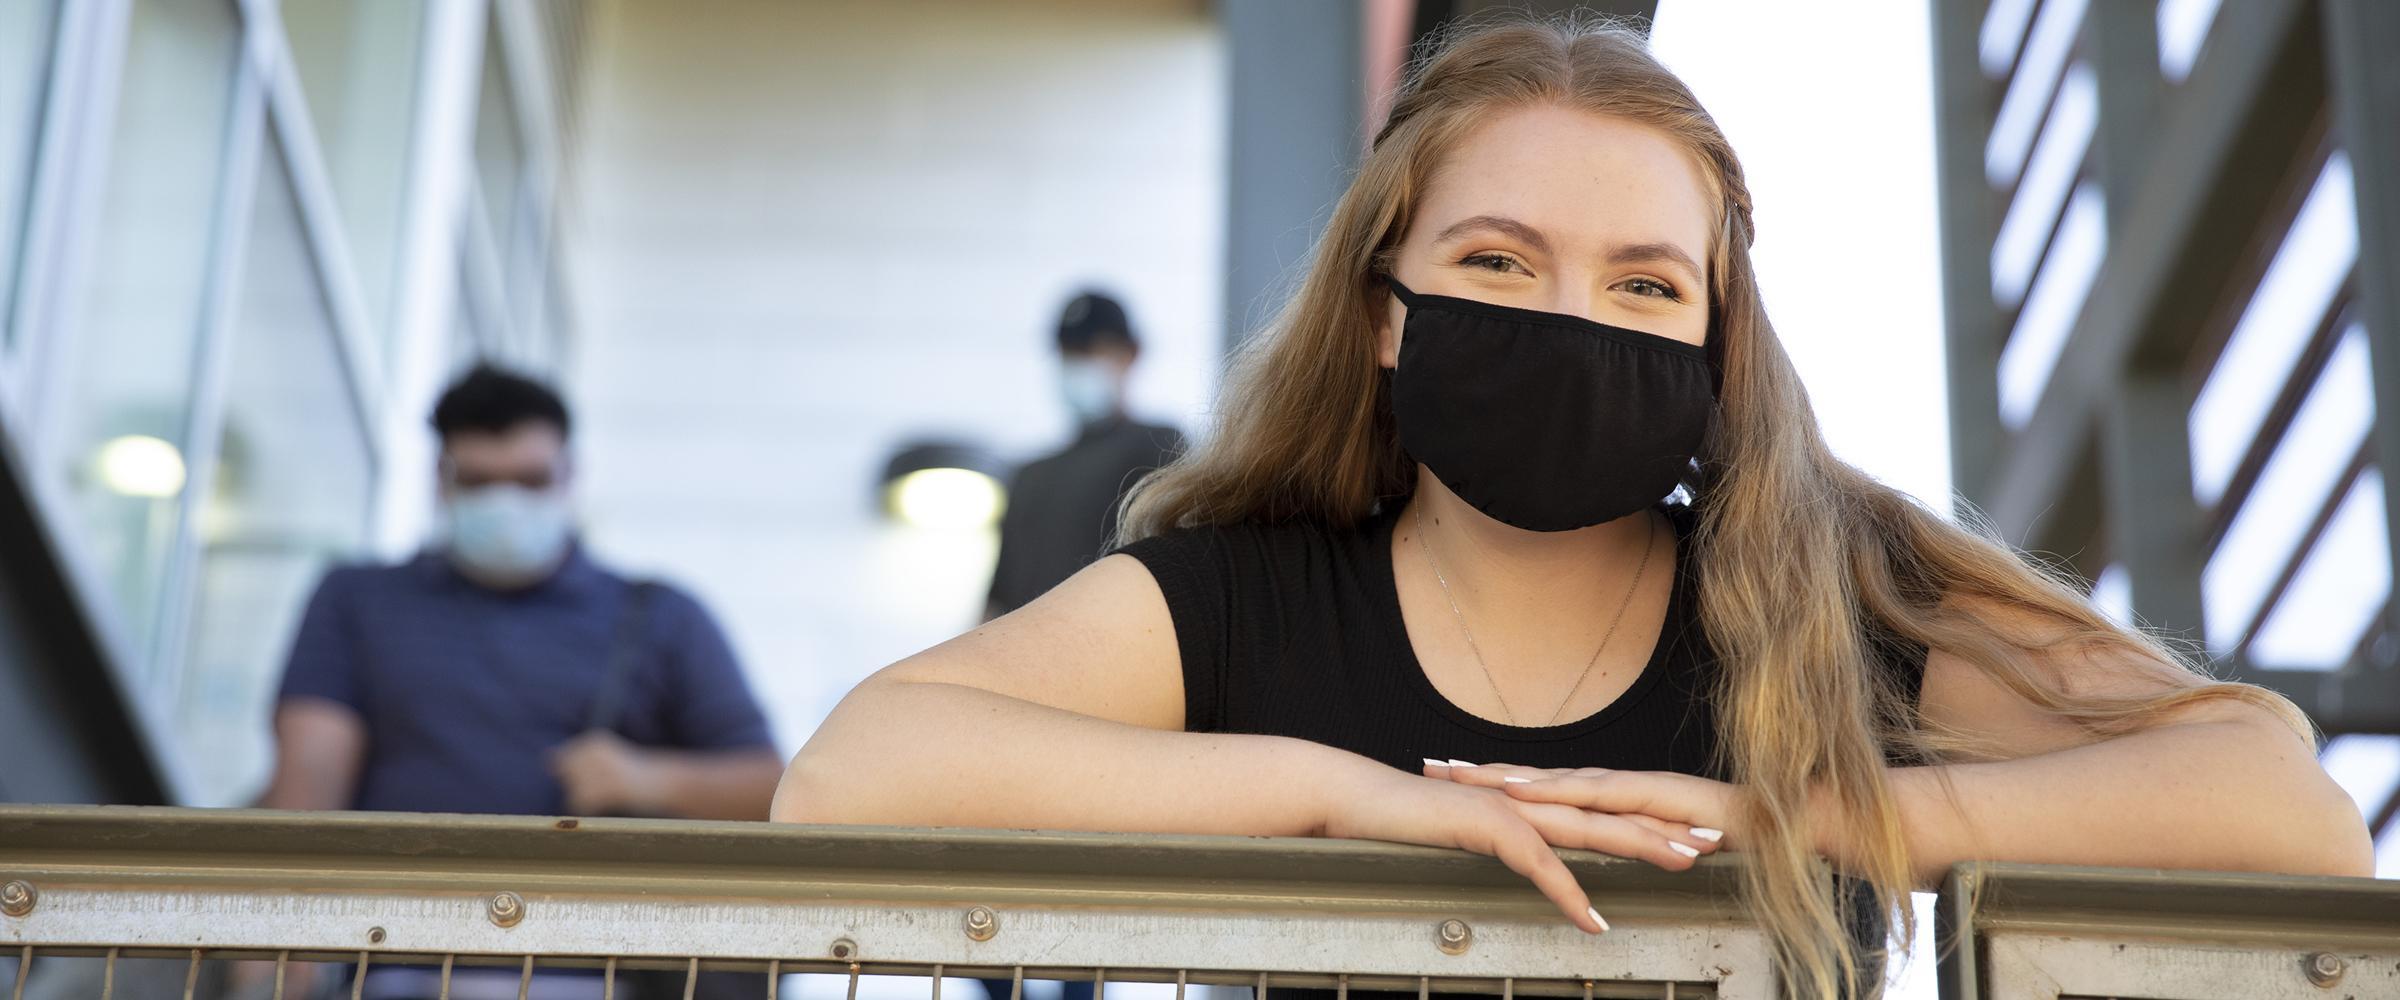 ASU student smiling on campus